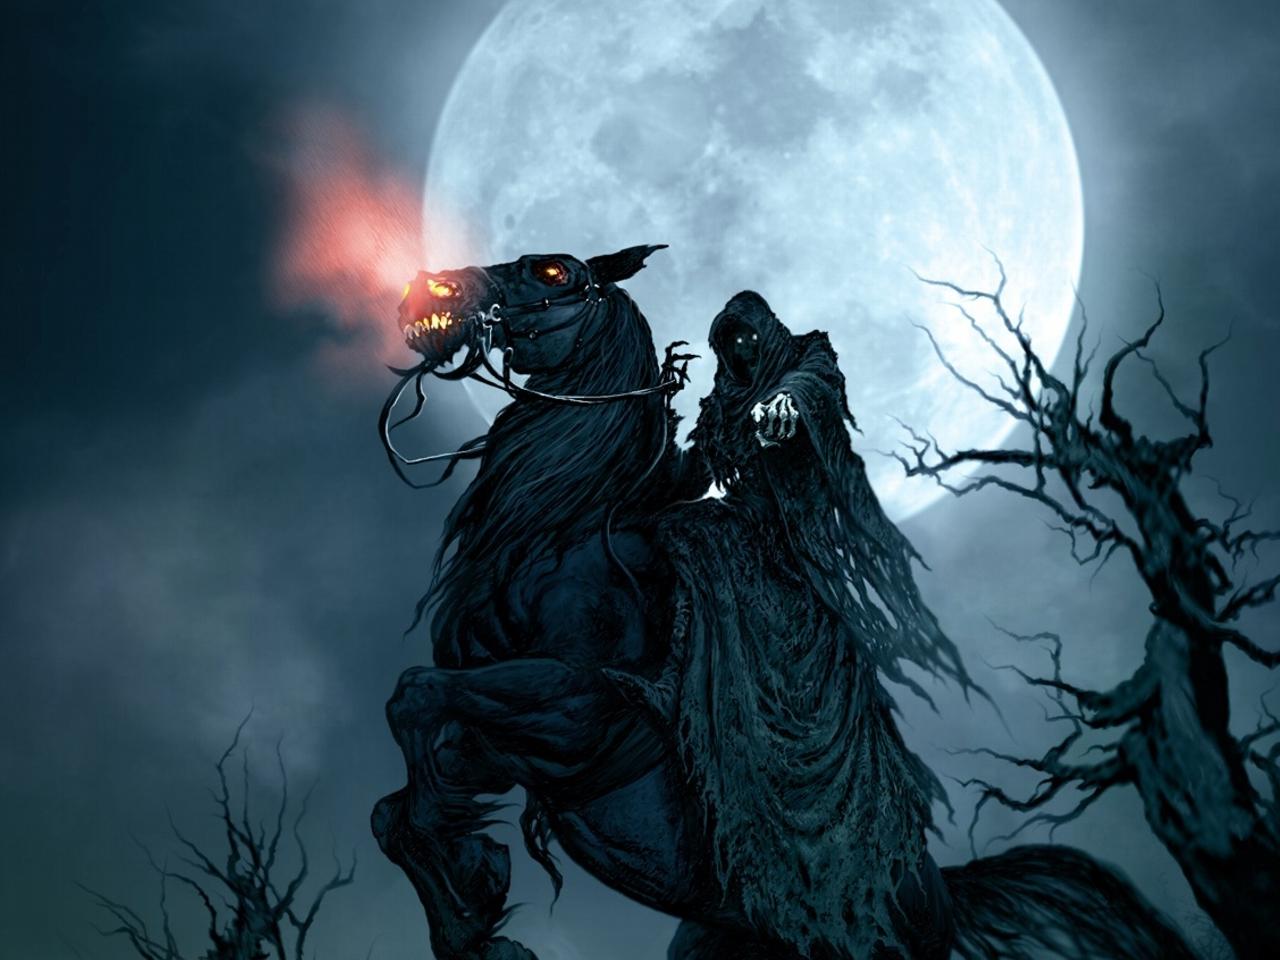 grim reaper Wallpaper Background 20676 1280x960